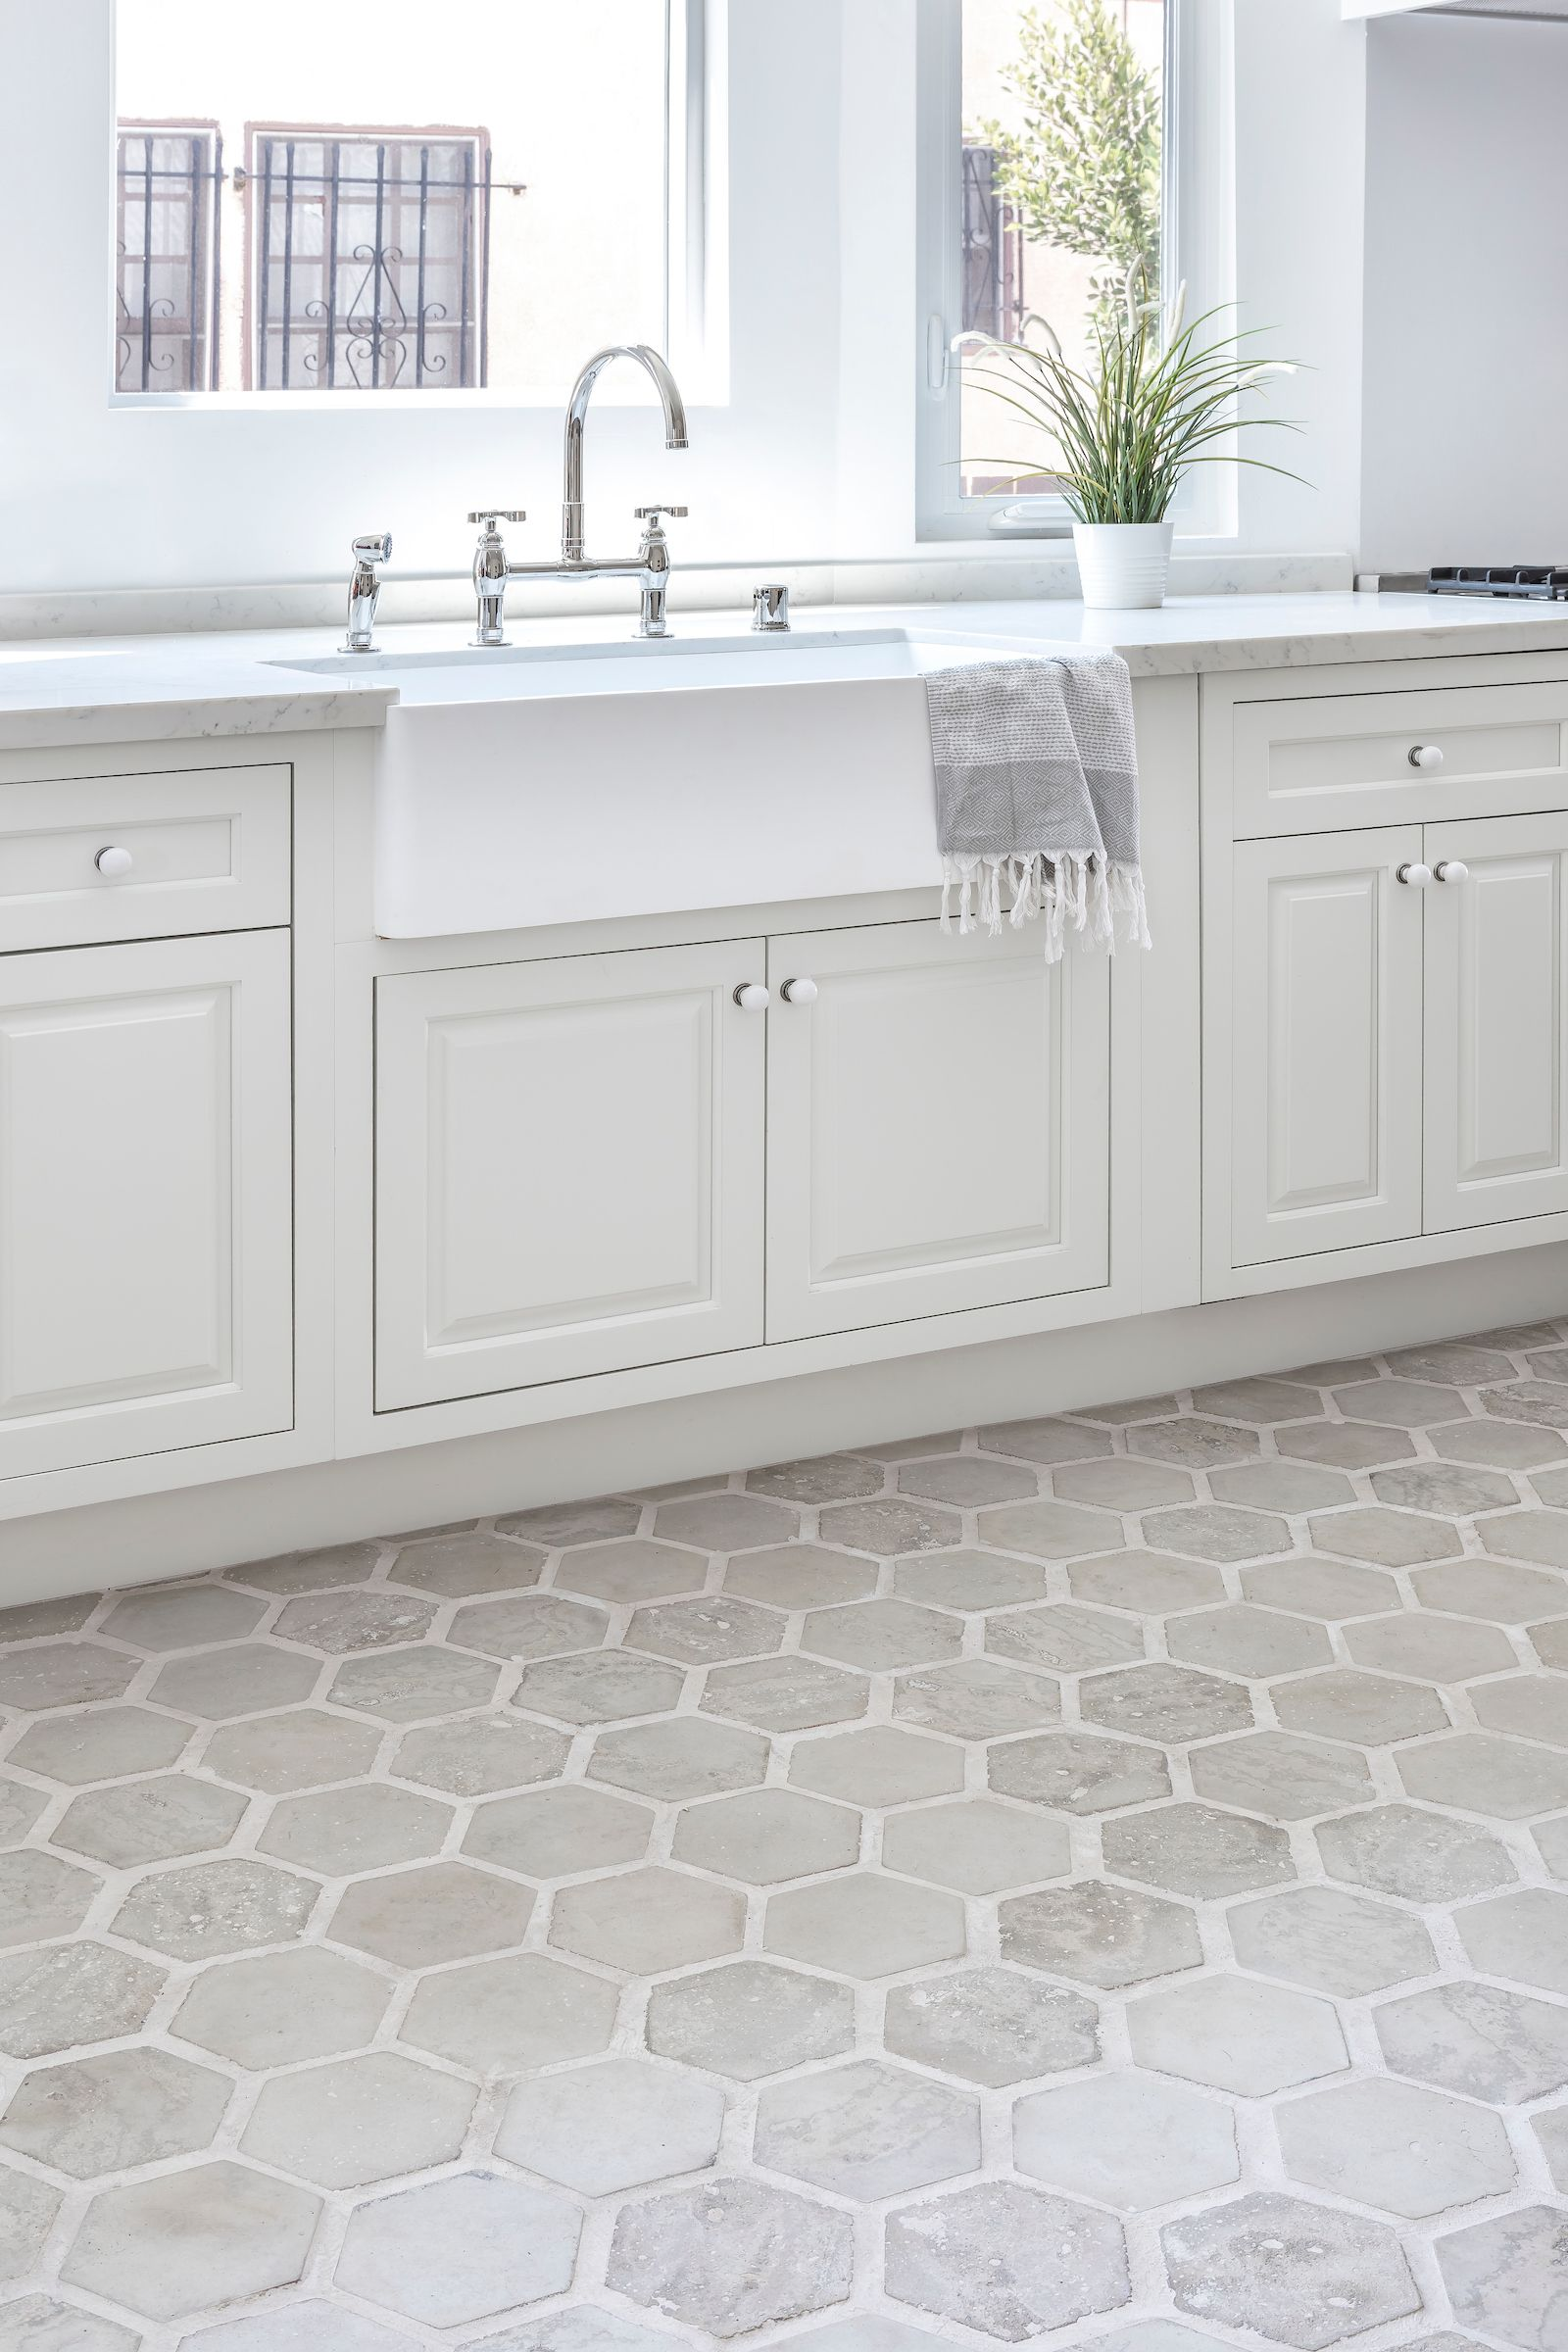 Light Gray Hexagon Concrete Flooring In This Neutral California